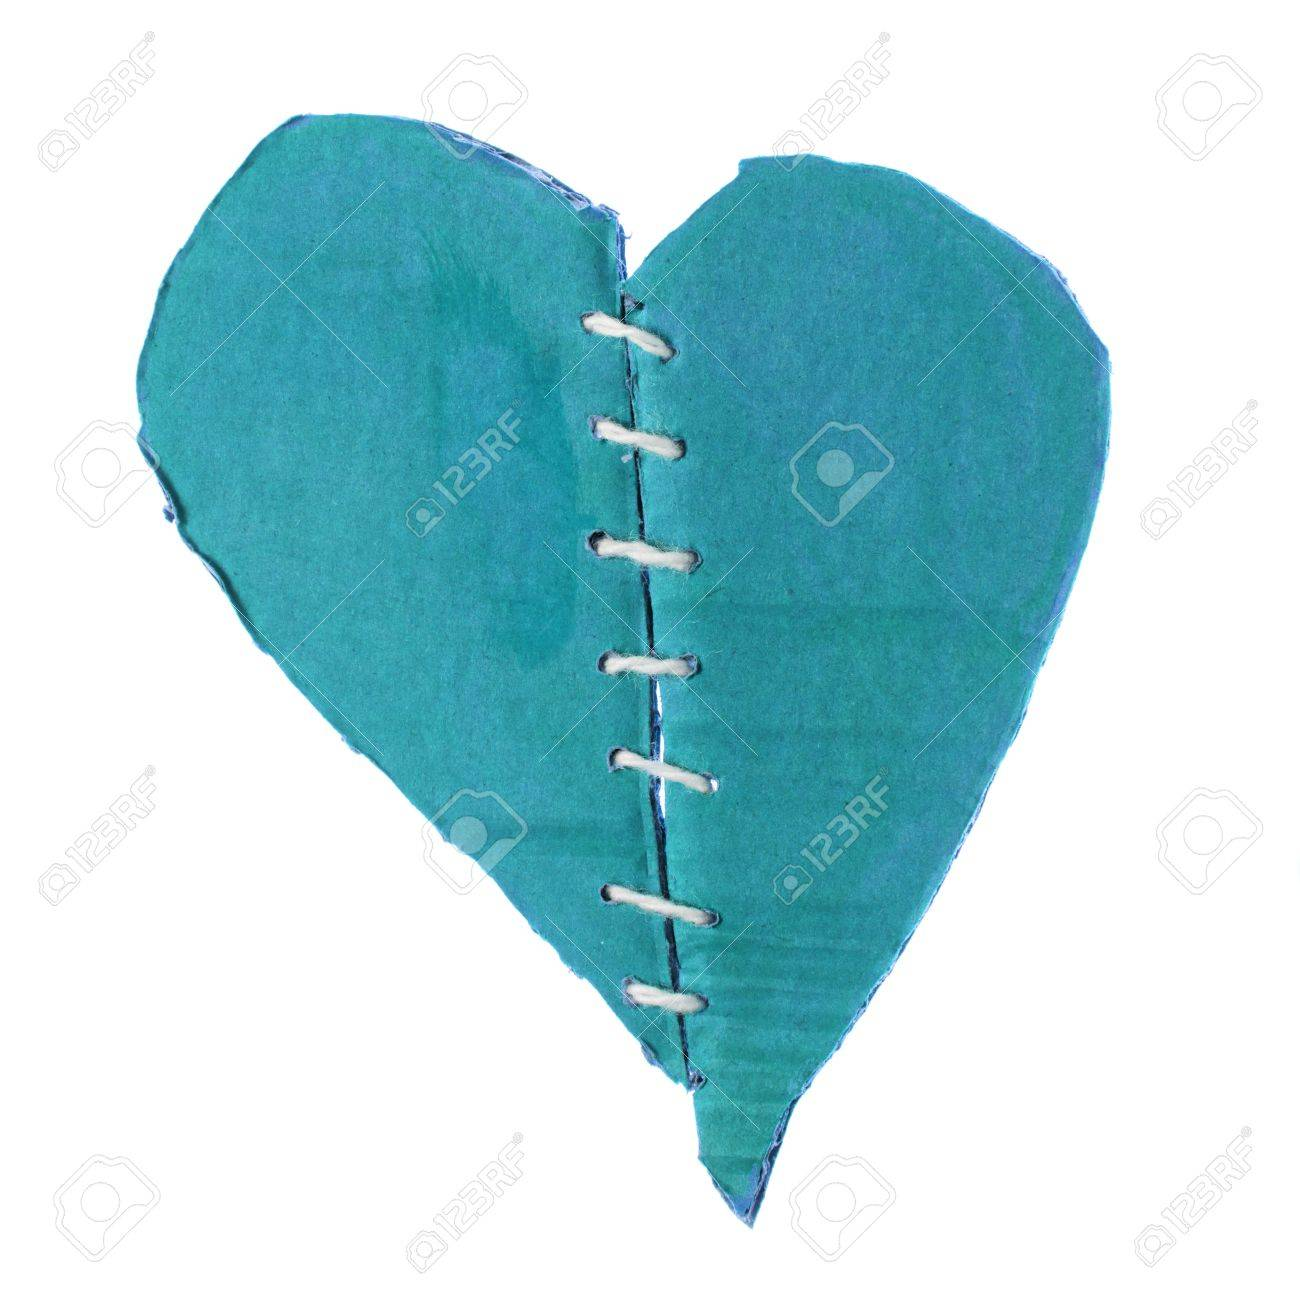 fixed brocken heart, isolated on white background Stock Photo - 17568948